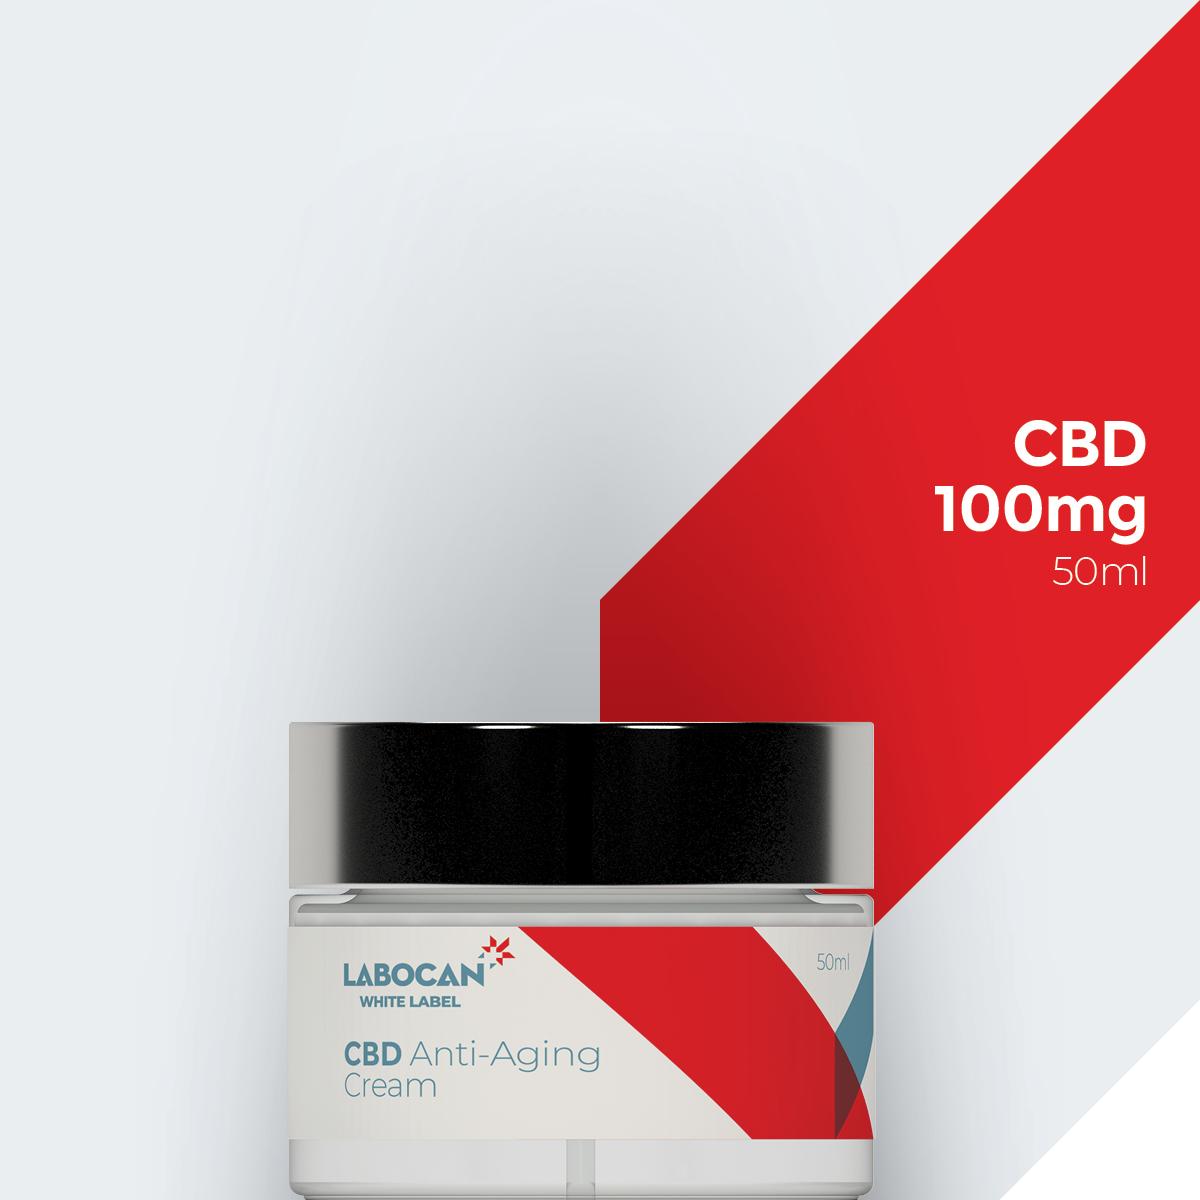 White Label CBD Anti-rimpelcrème